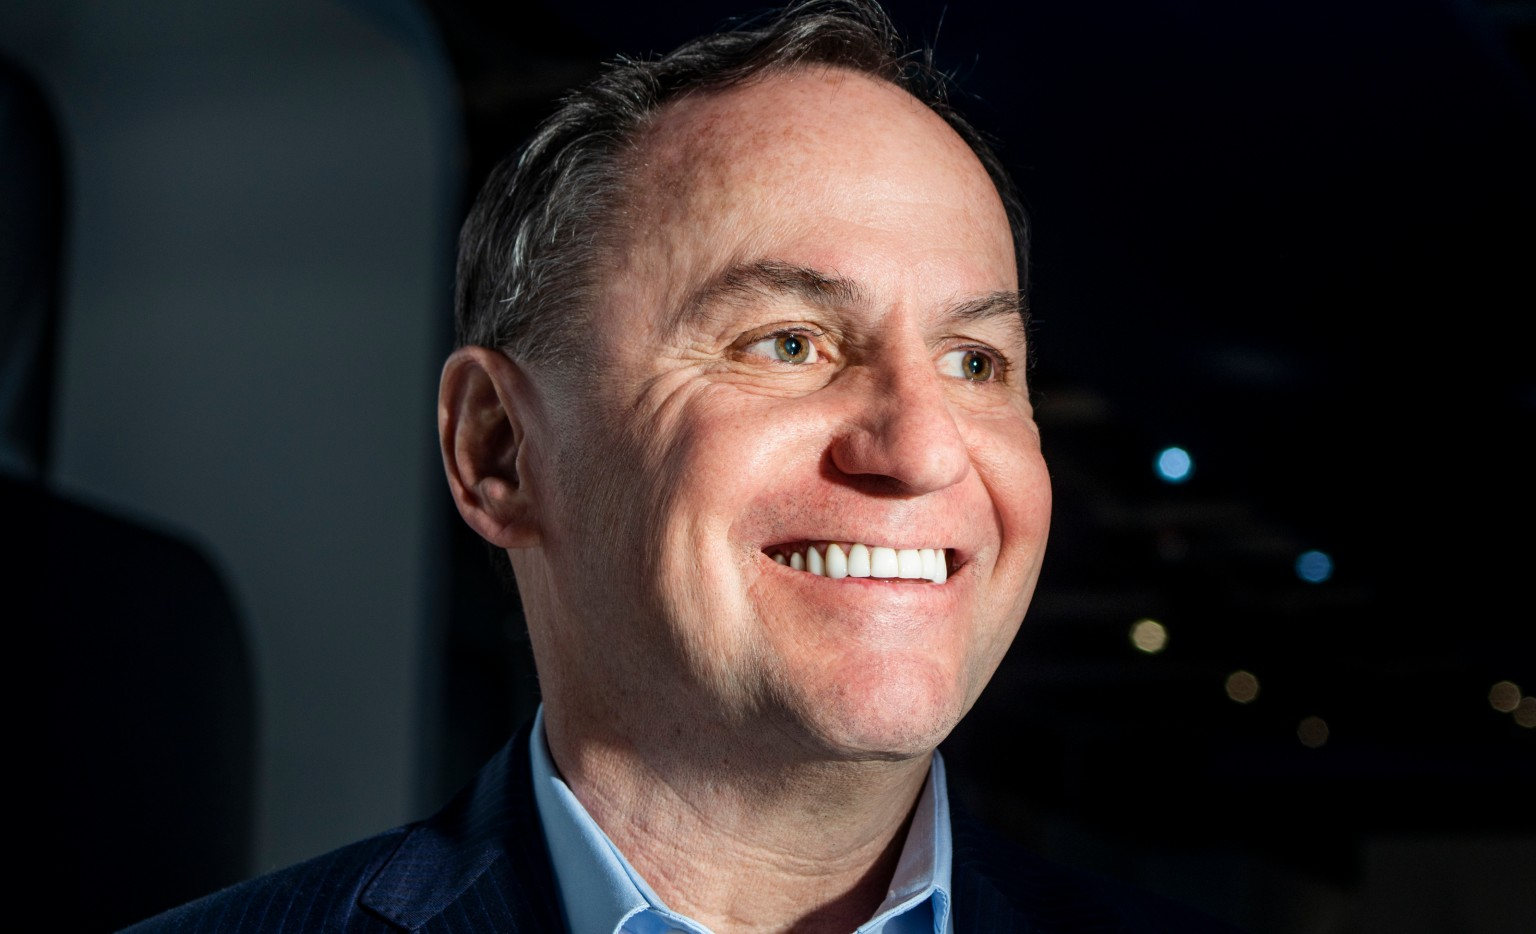 Bob Swan, Intel